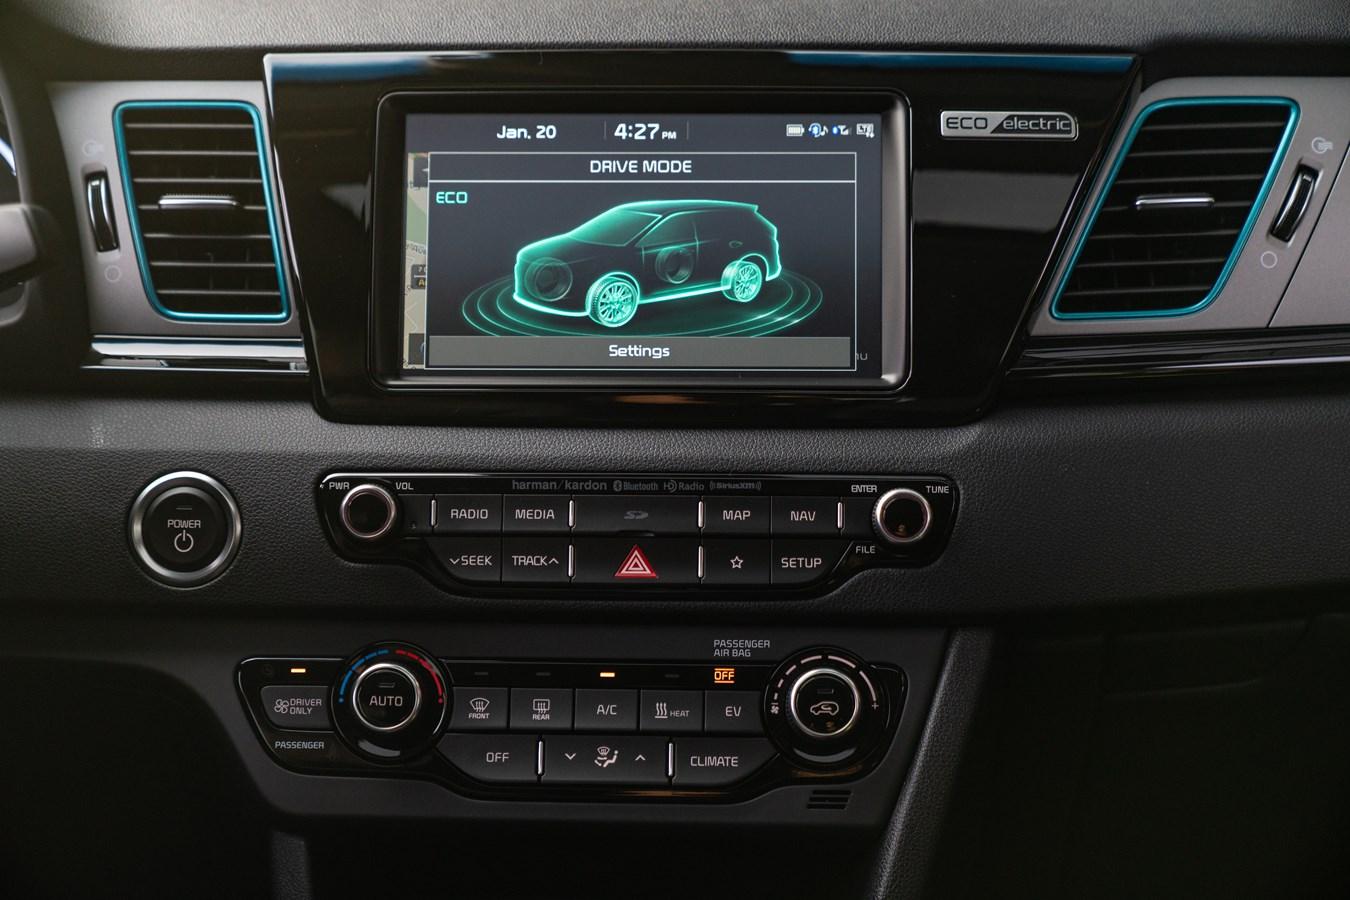 Kia Niro EV Infotainment system